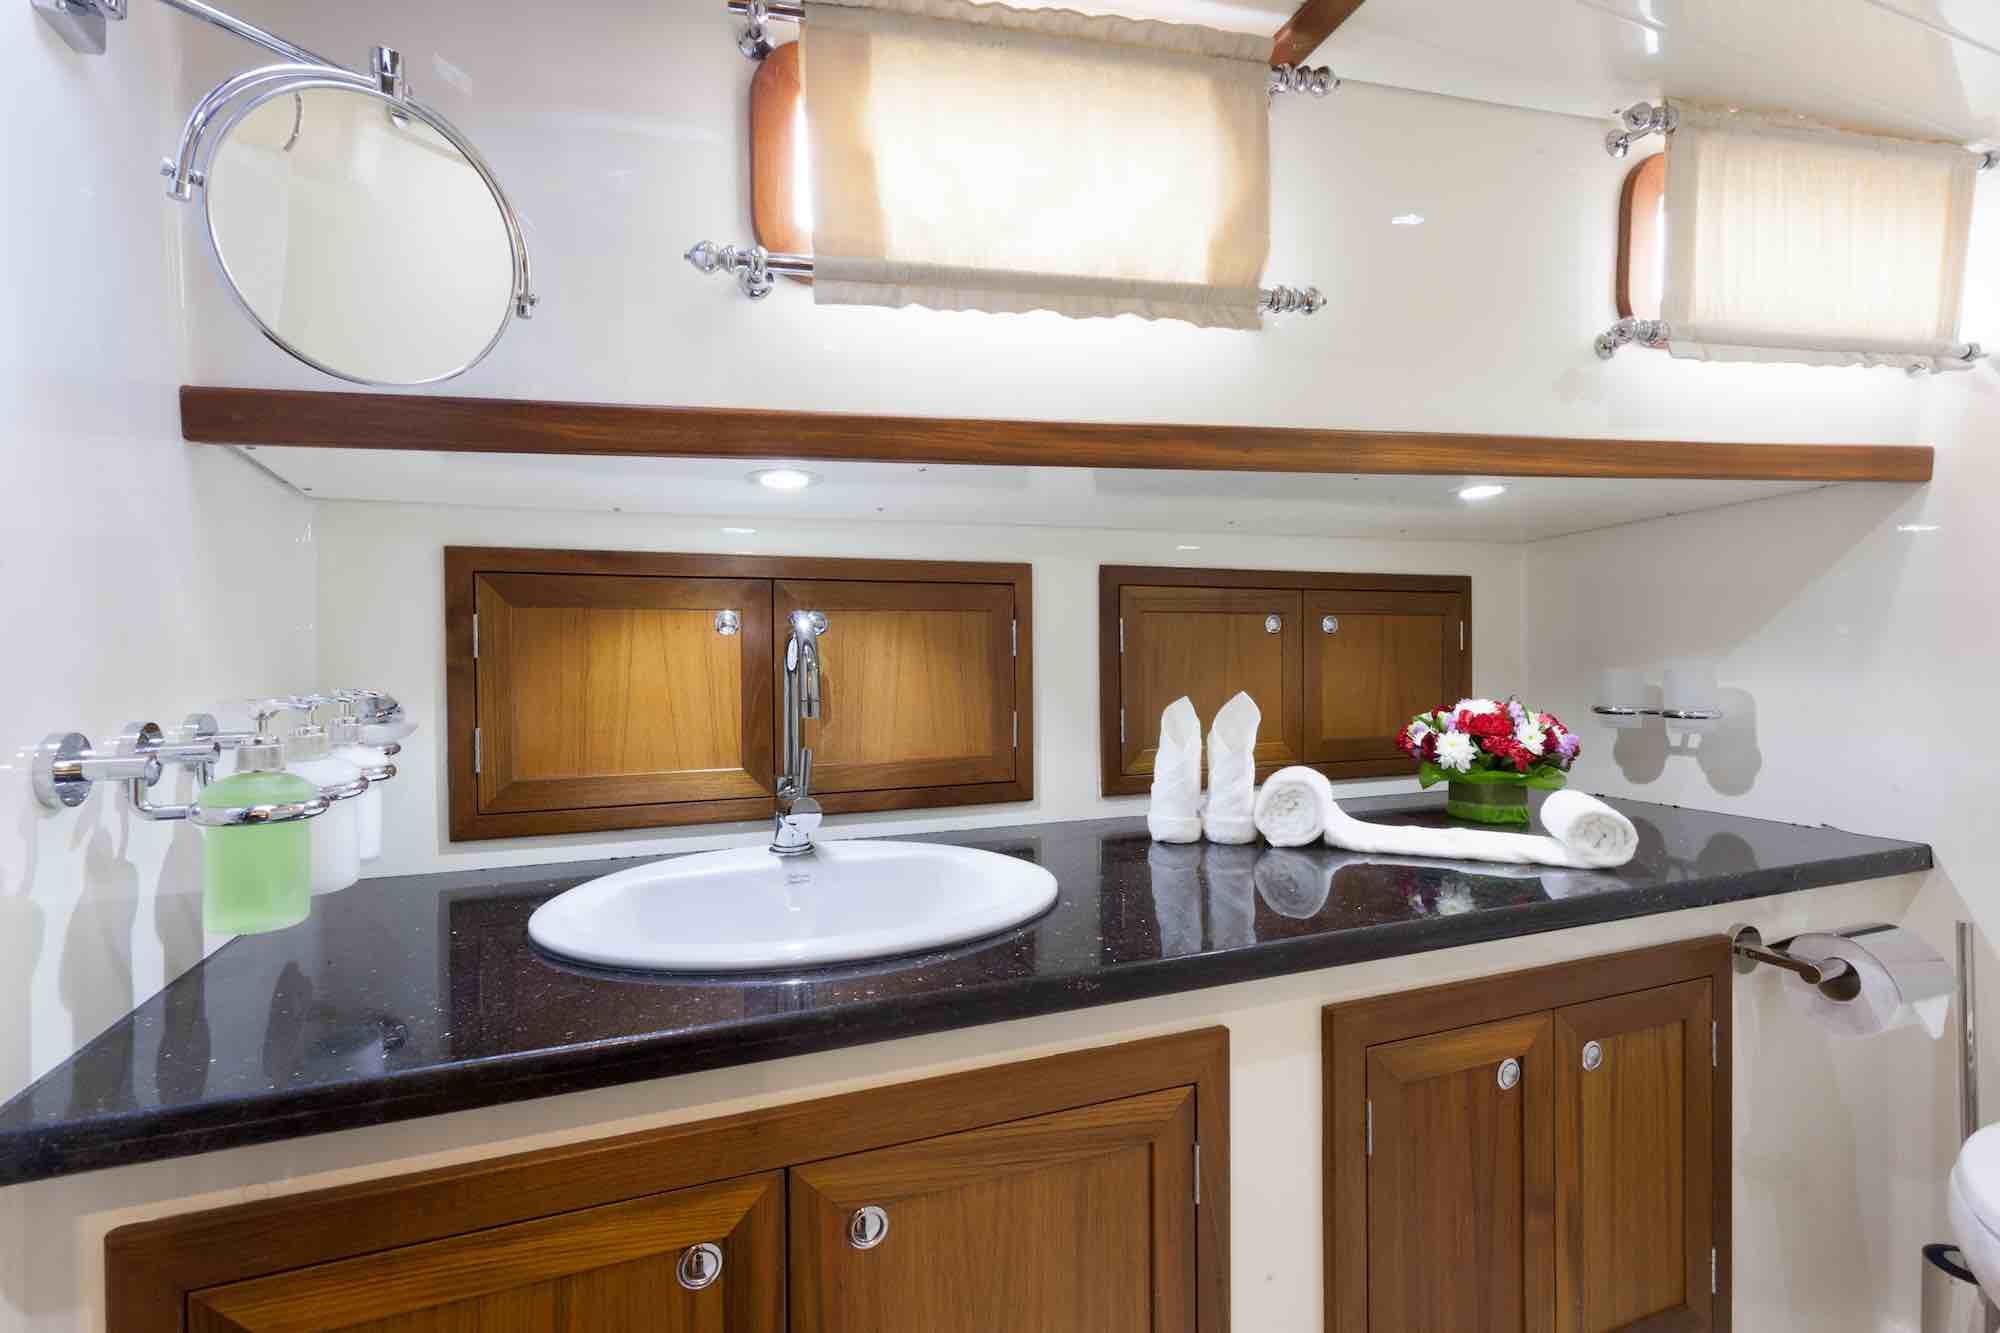 Dallinghoo_guest cabin bathroom sailing in Mergui 1_XS.jpeg